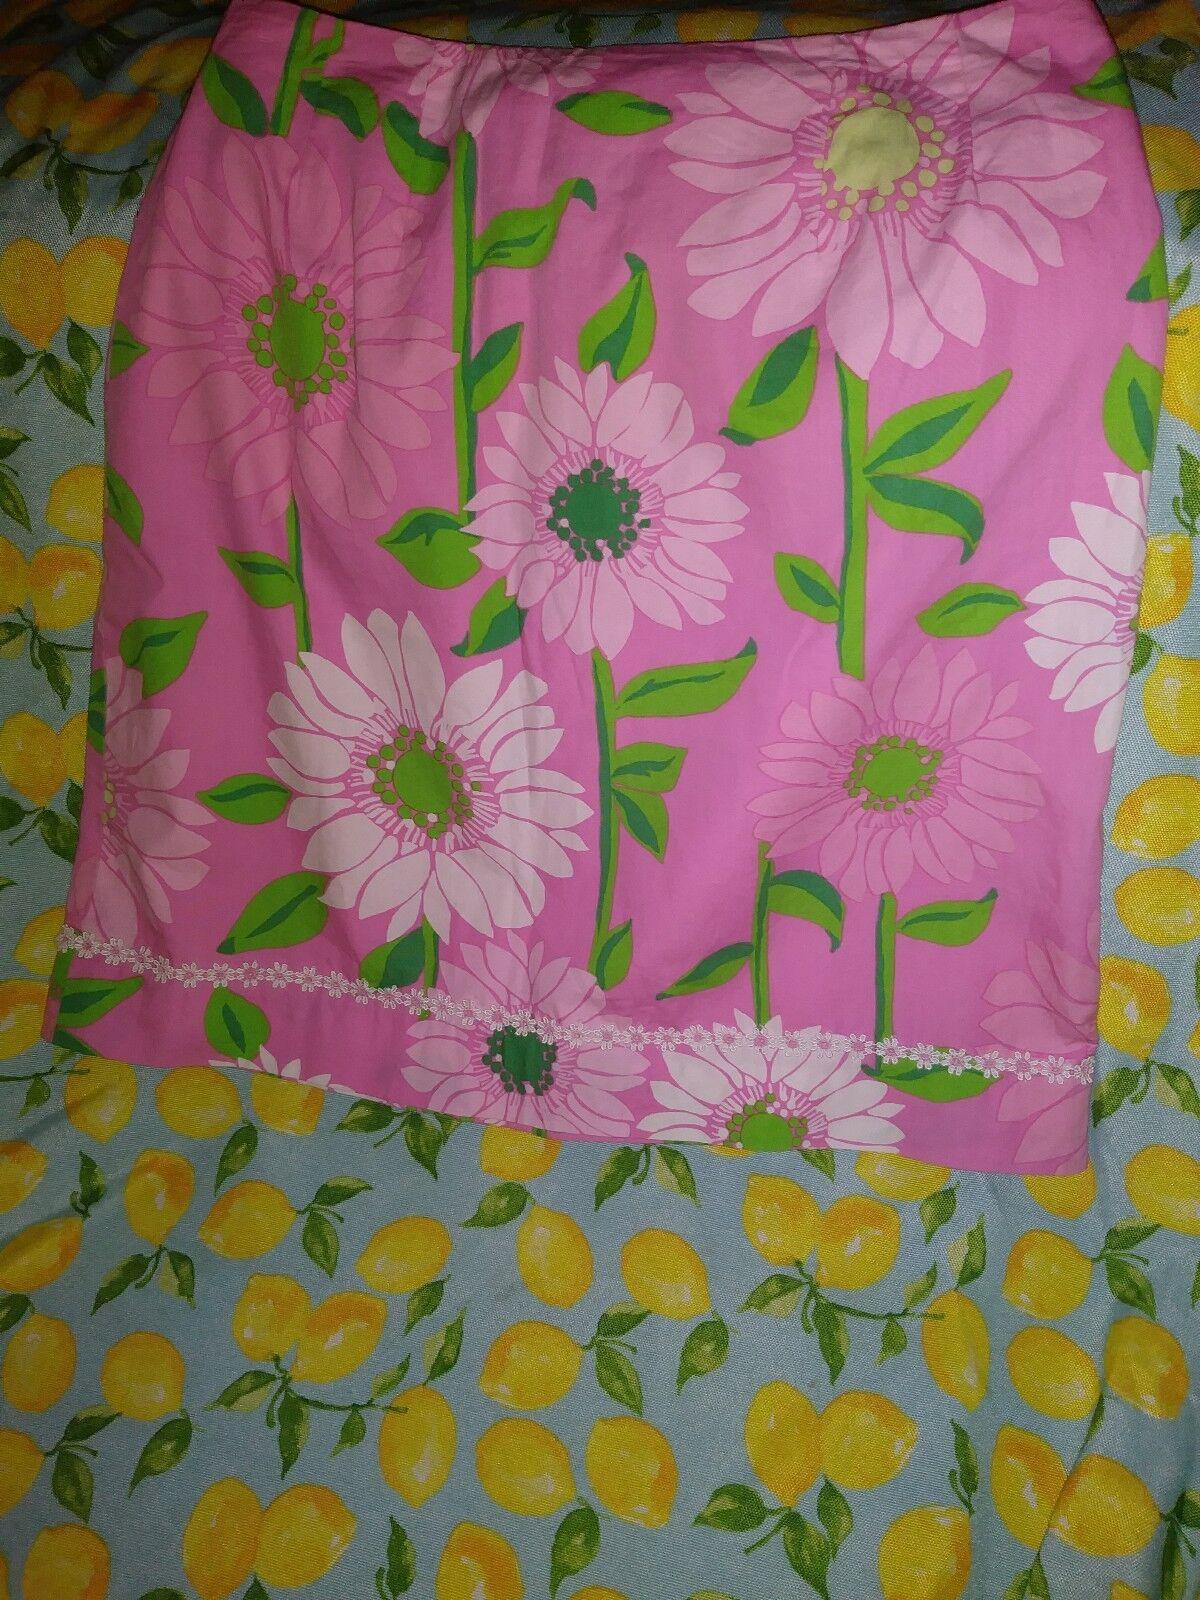 Lilly Pulitzer Pink Soleil Sunflower Floral Skirt Beautiful Sz 2